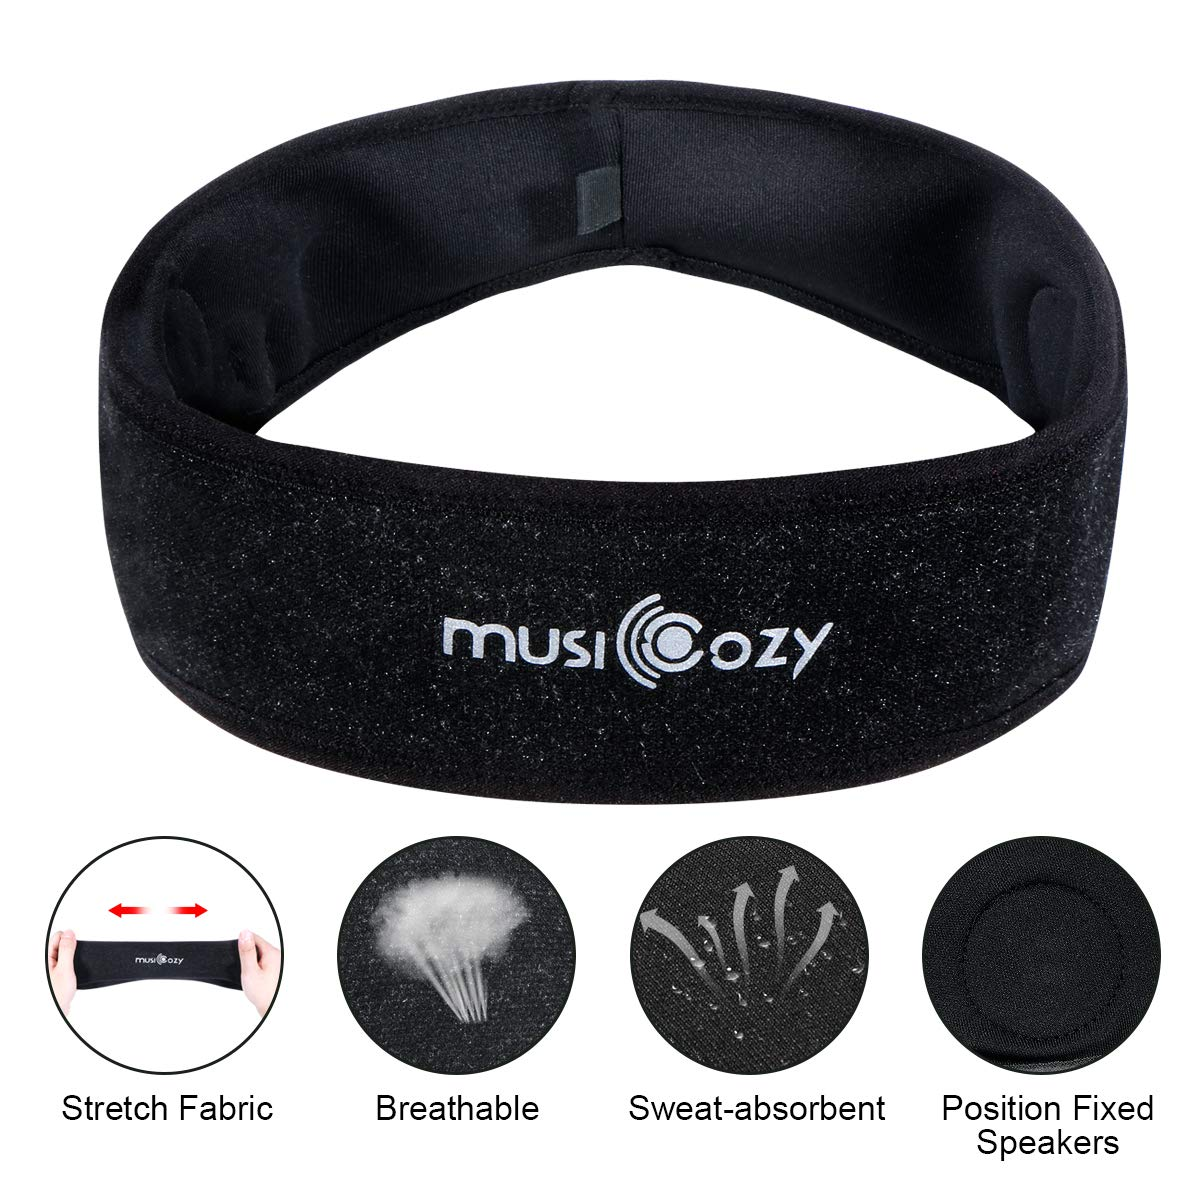 Bluetooth Sleep Headphones Eye Mask, Wu-minglu Sleep Mask Bluetooth Sleeping Headphones Headband Headphones for Sleeping Sleep Headphones Bluetooth Headbands Noise Cancelling,Black